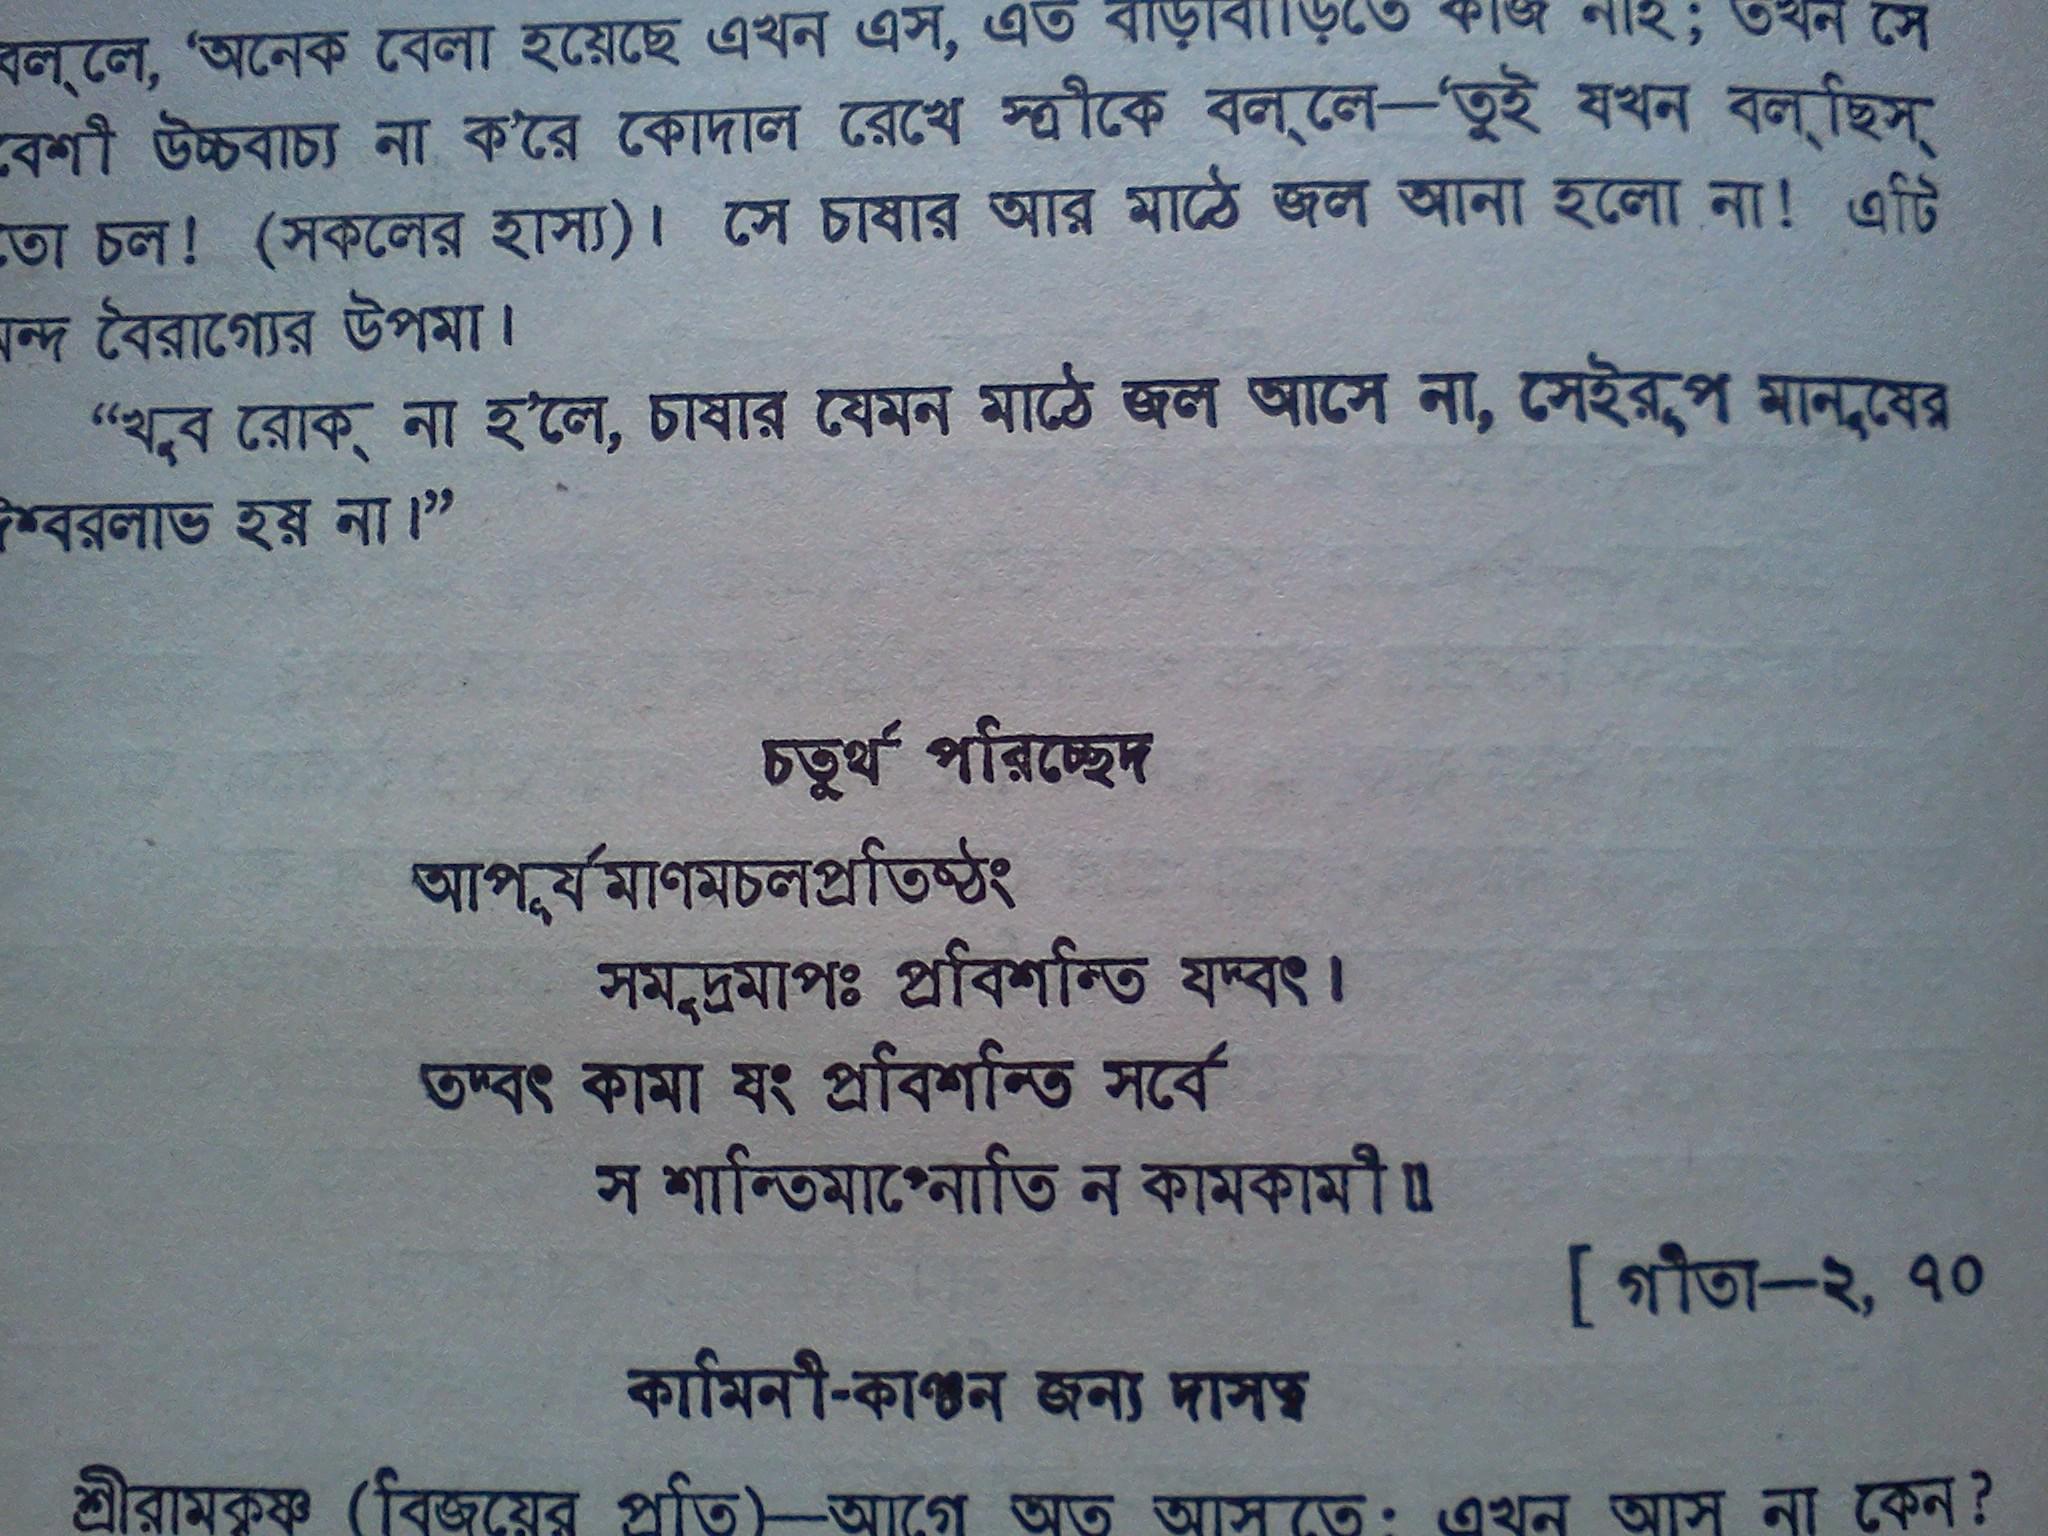 Ramcharitmanas prashnavali